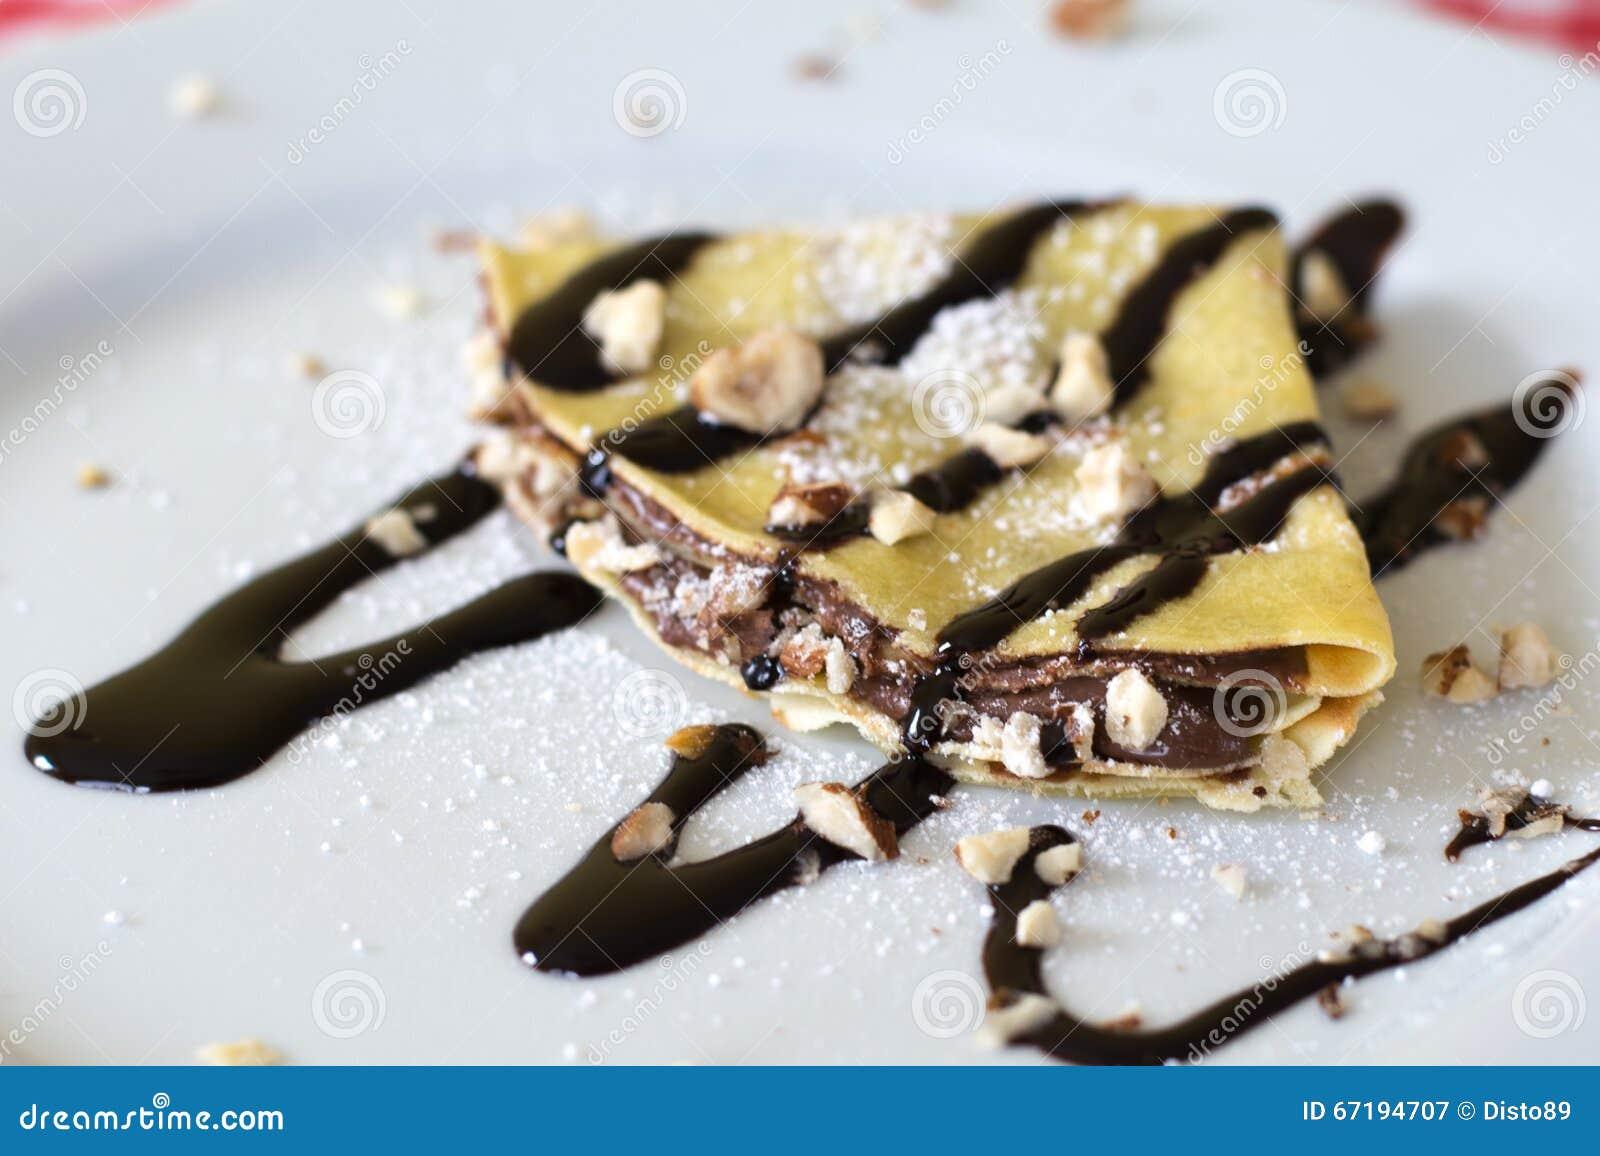 Almond Meal White Chocolate Cake